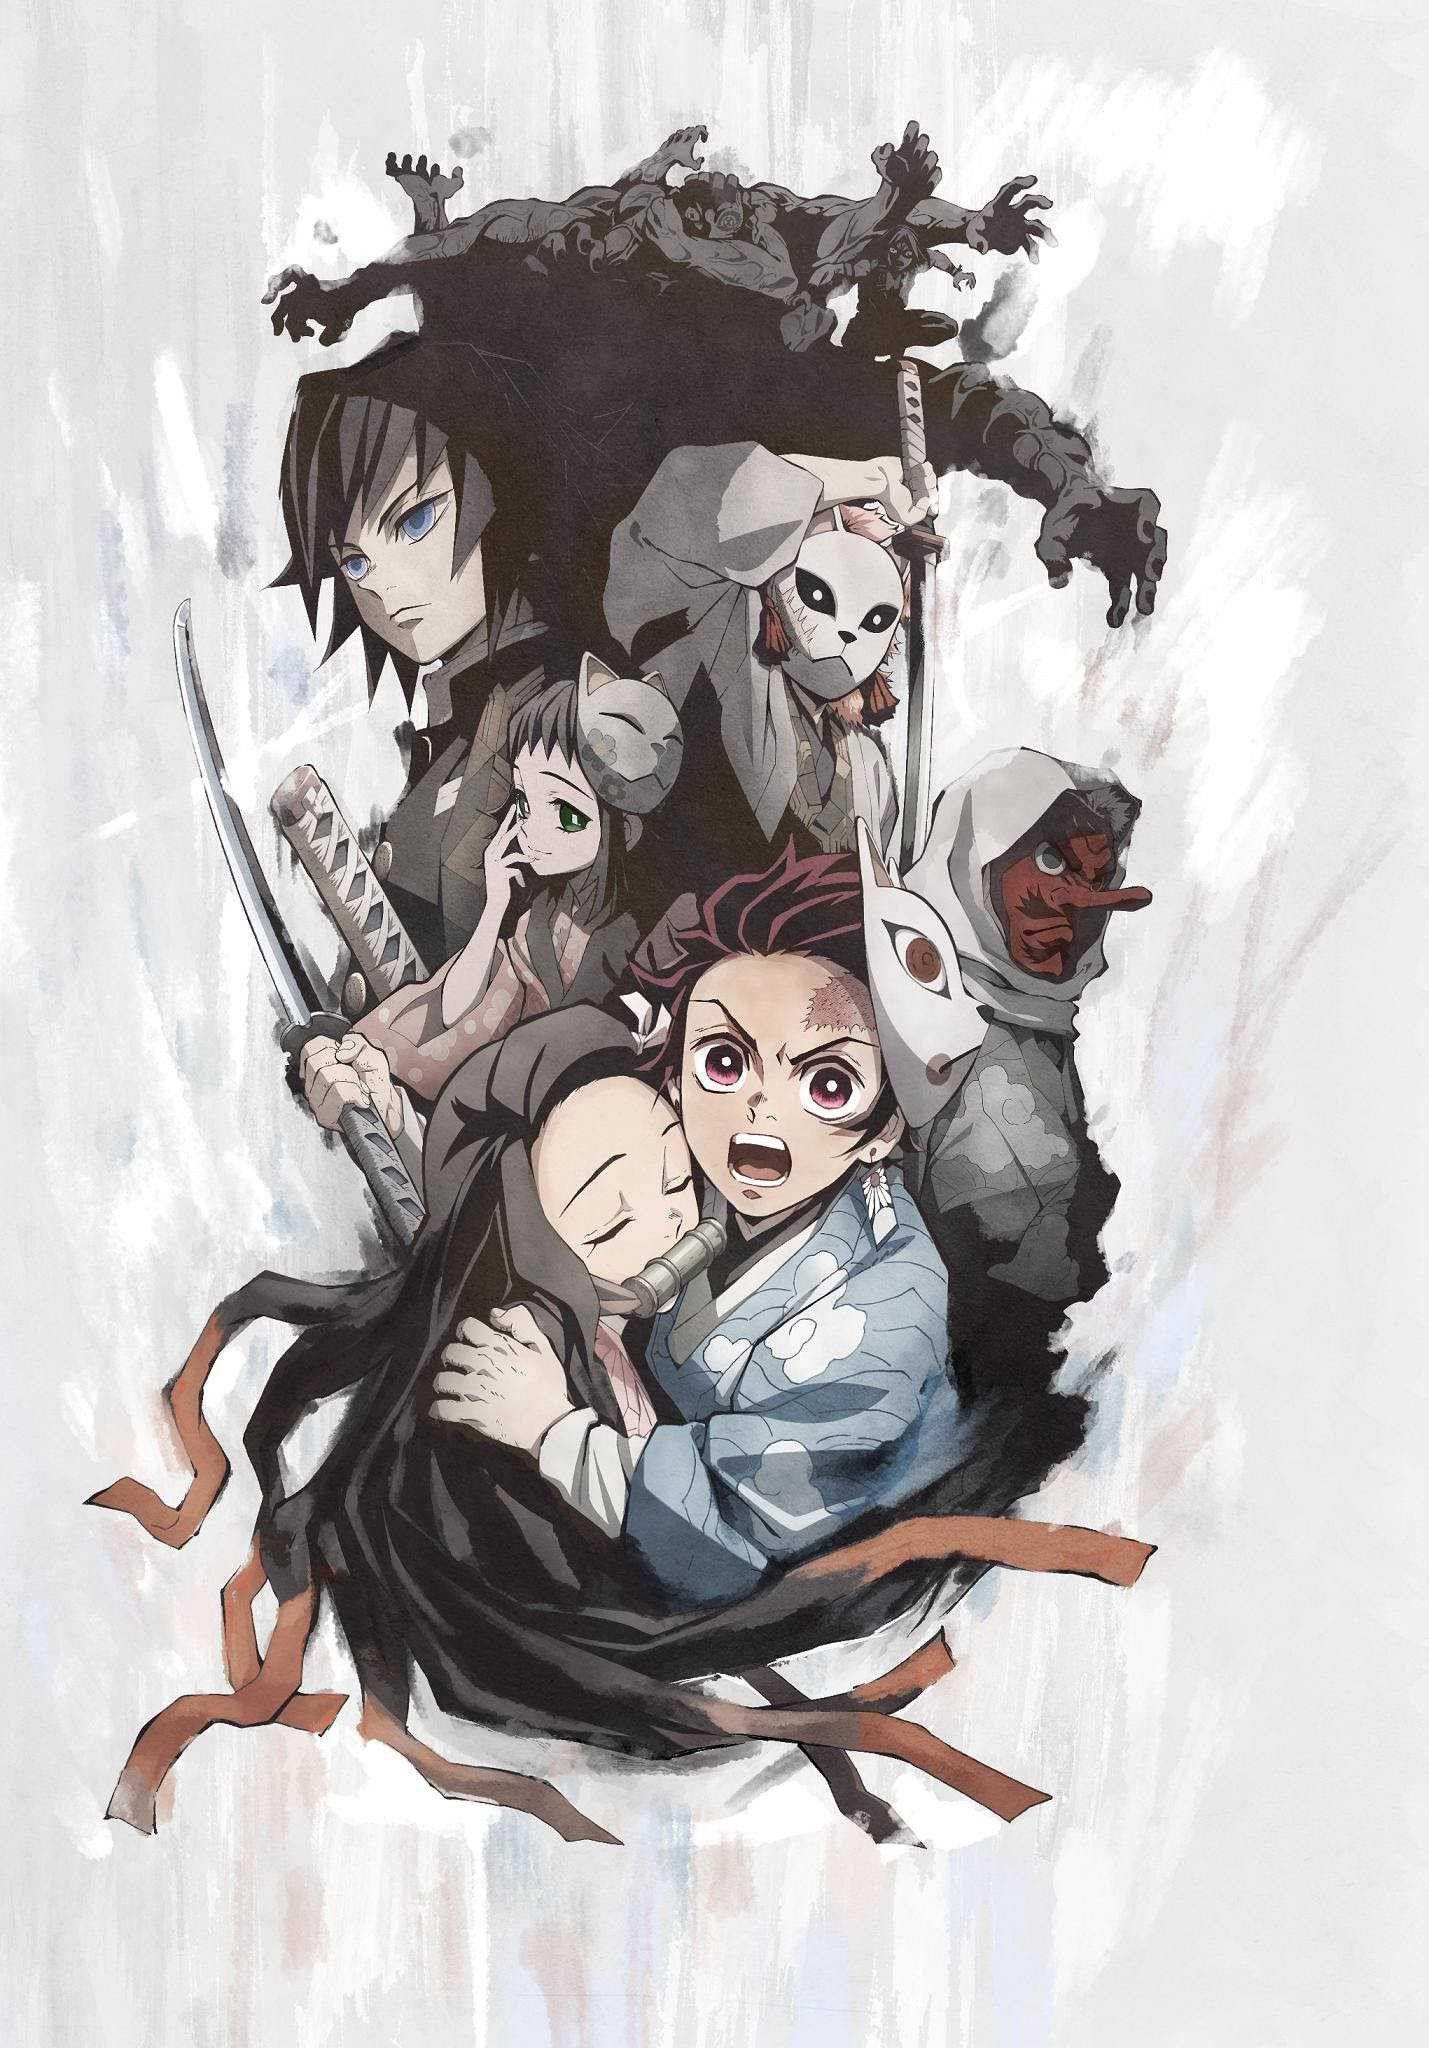 Demon Slayer In 2020 Anime Demon Anime Anime Images